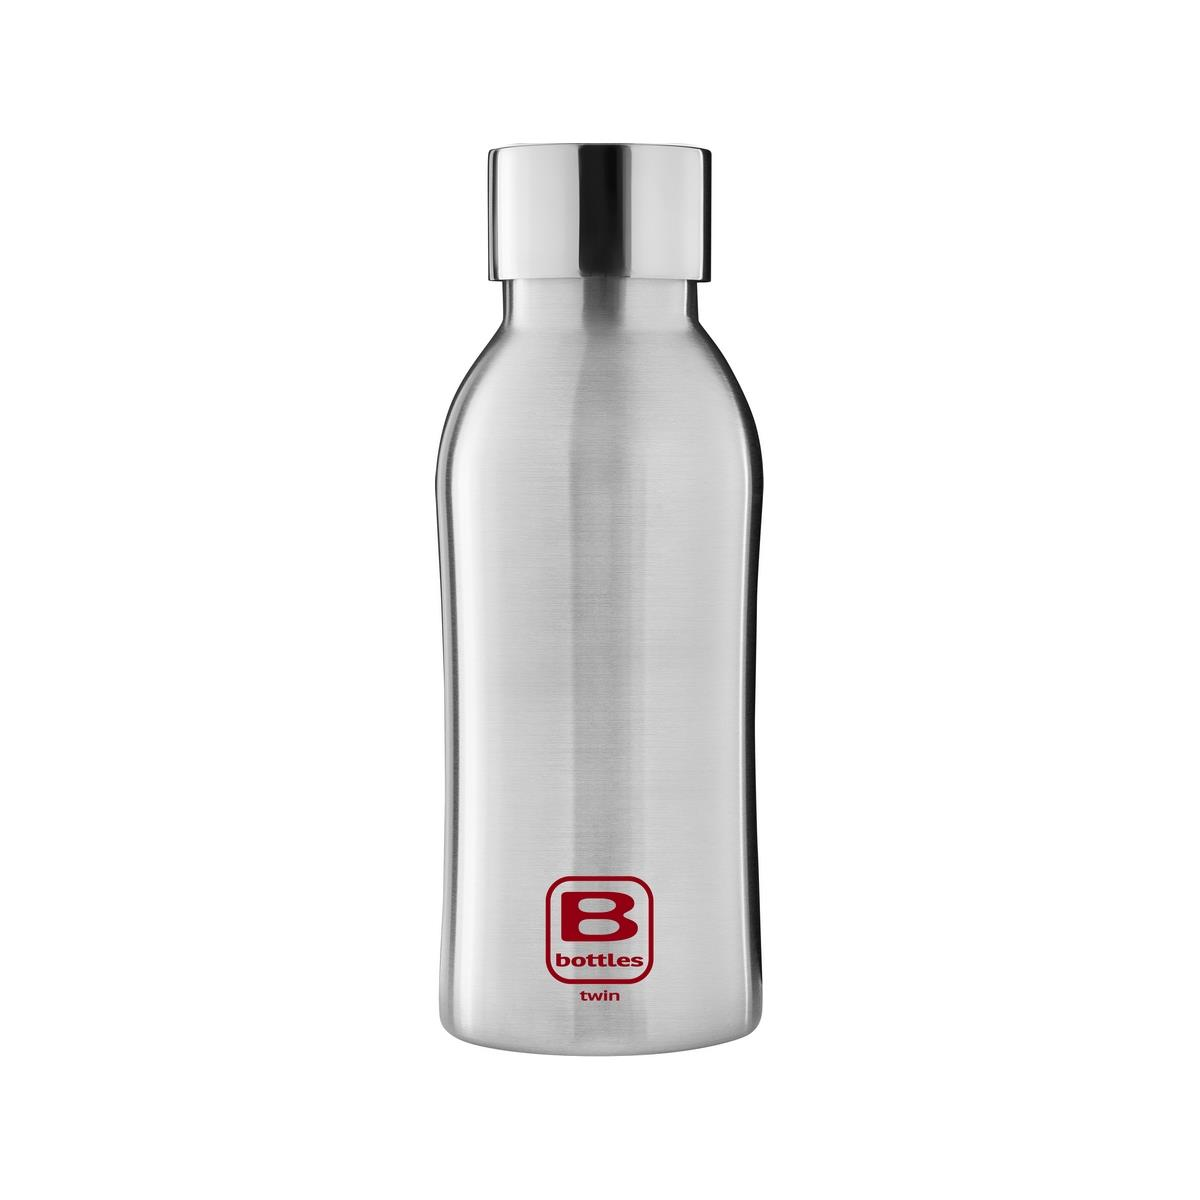 B Bottles Twin - Steel Brushed - 350 ml - Bottiglia Termica a doppia parete in acciaio inox 18/10